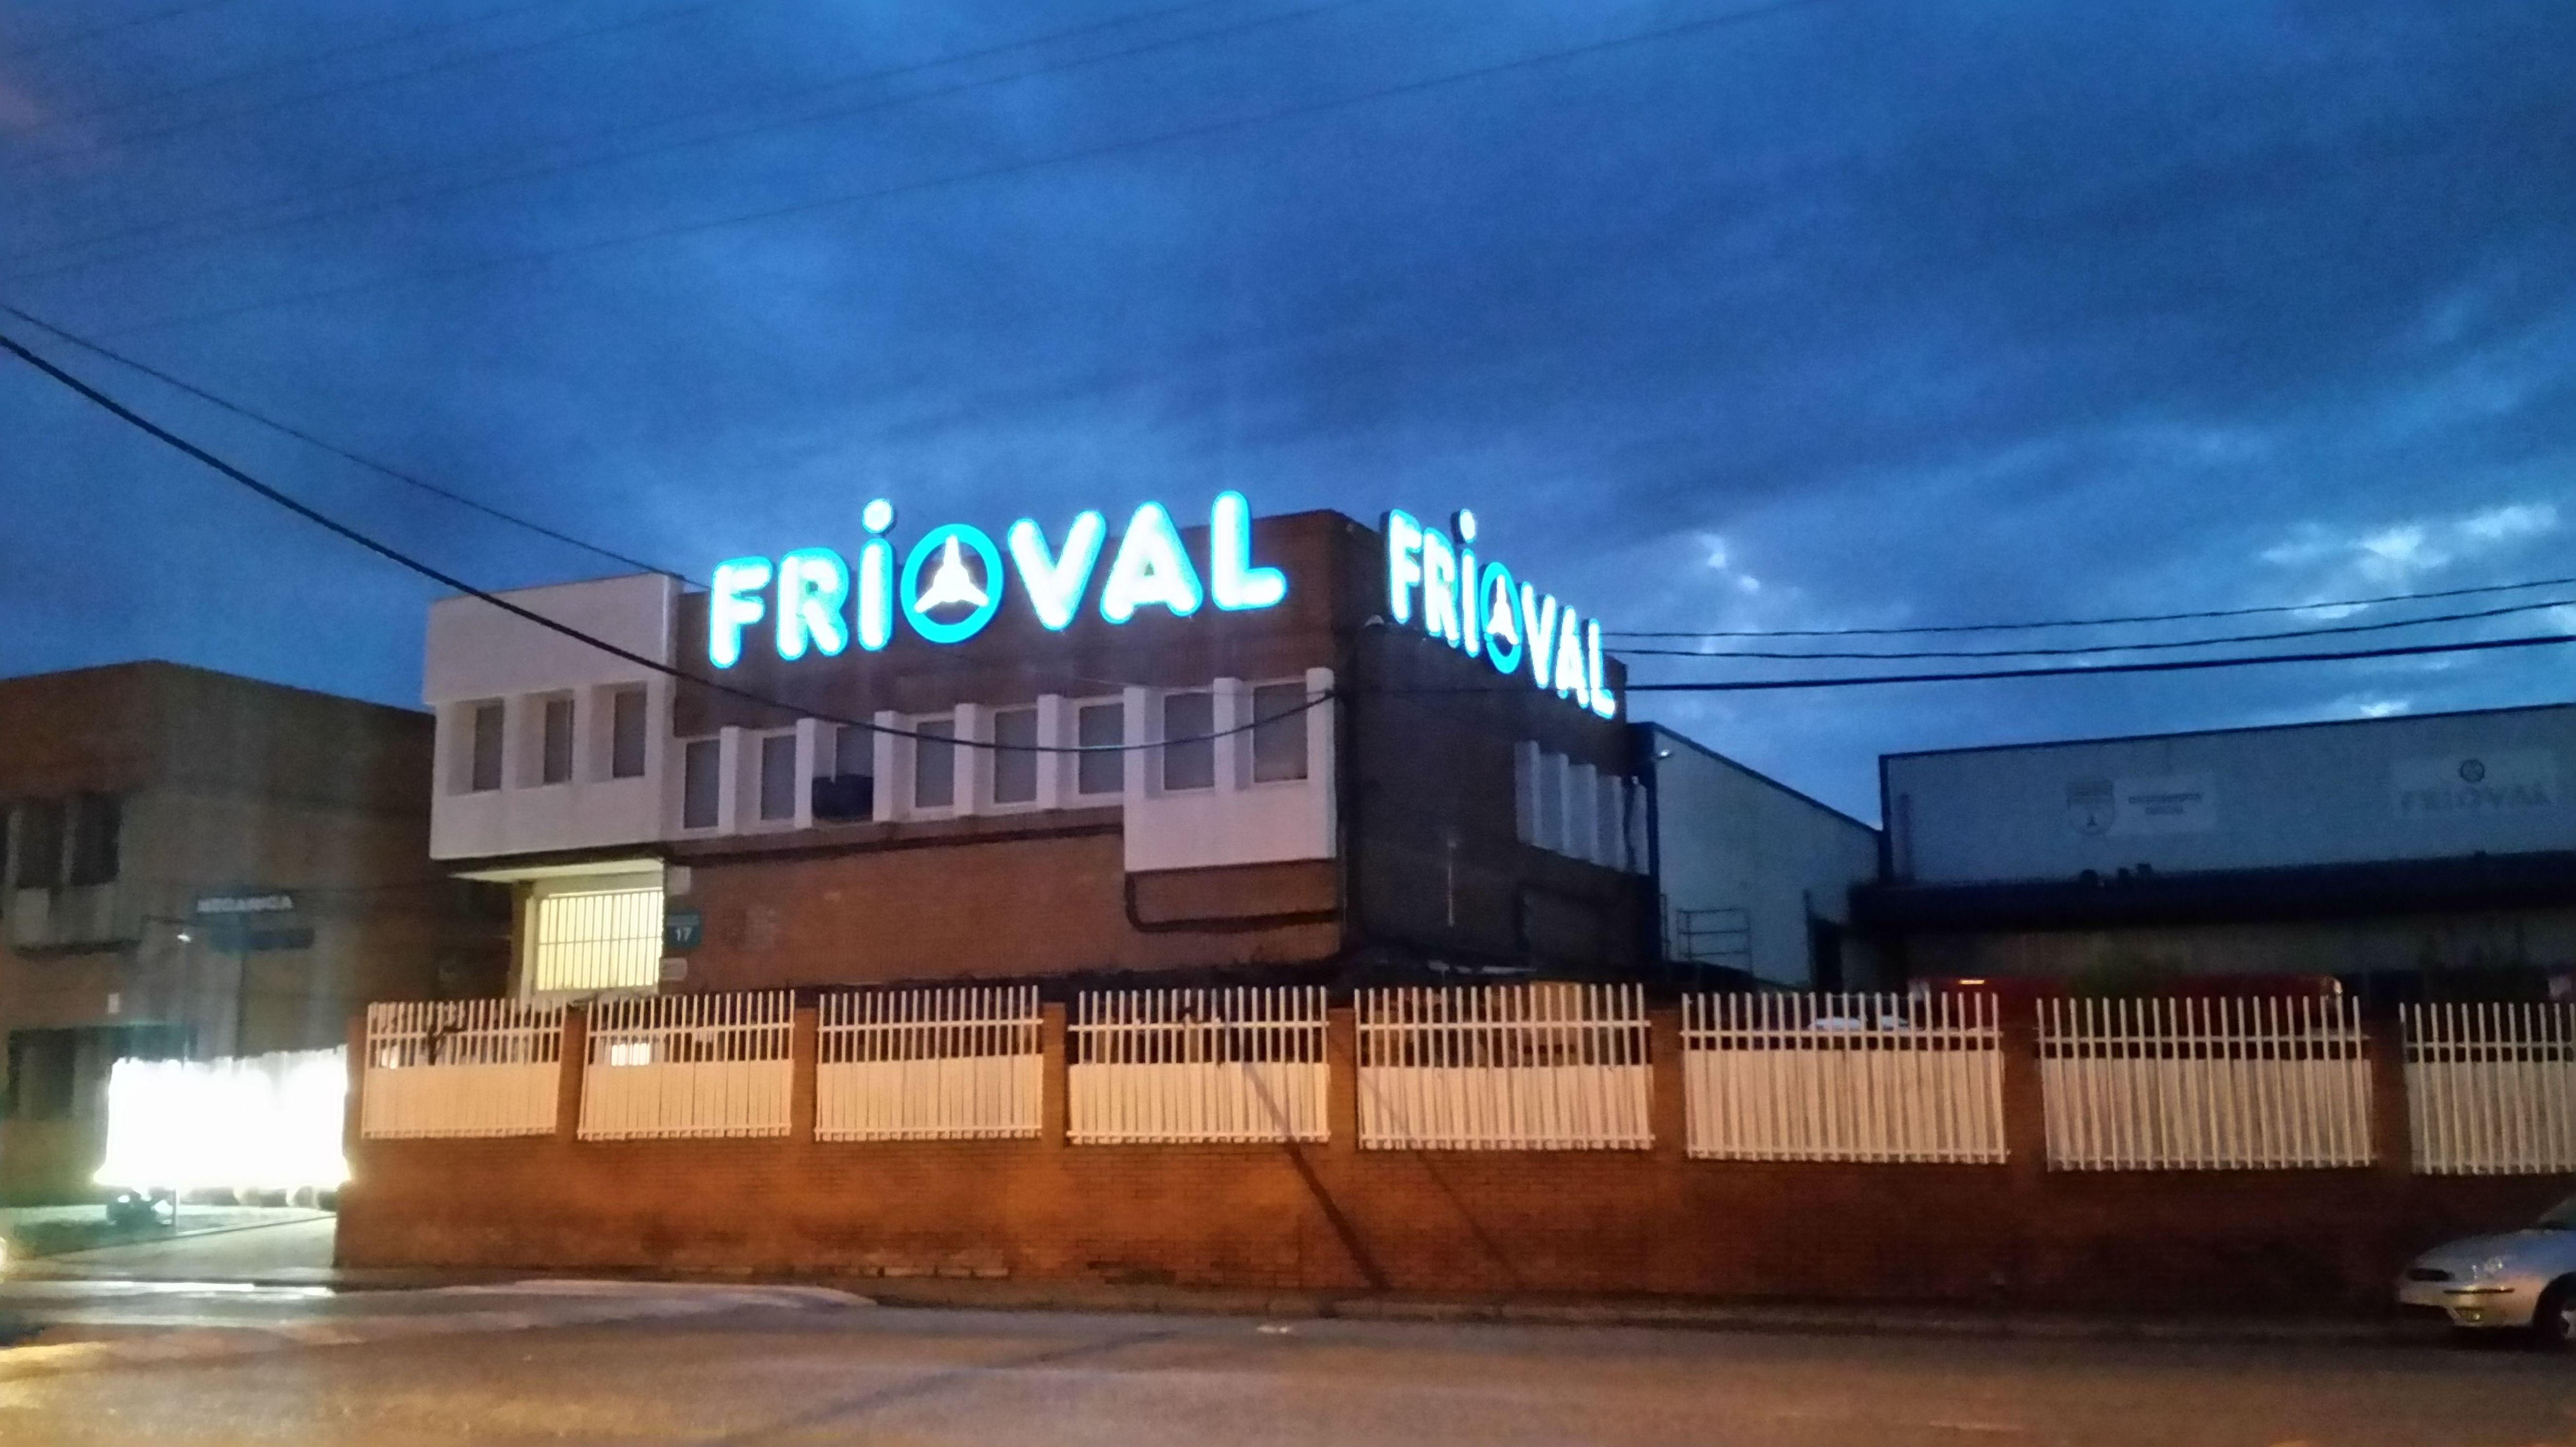 Frioval, tu taller mecanico en Valdemoro